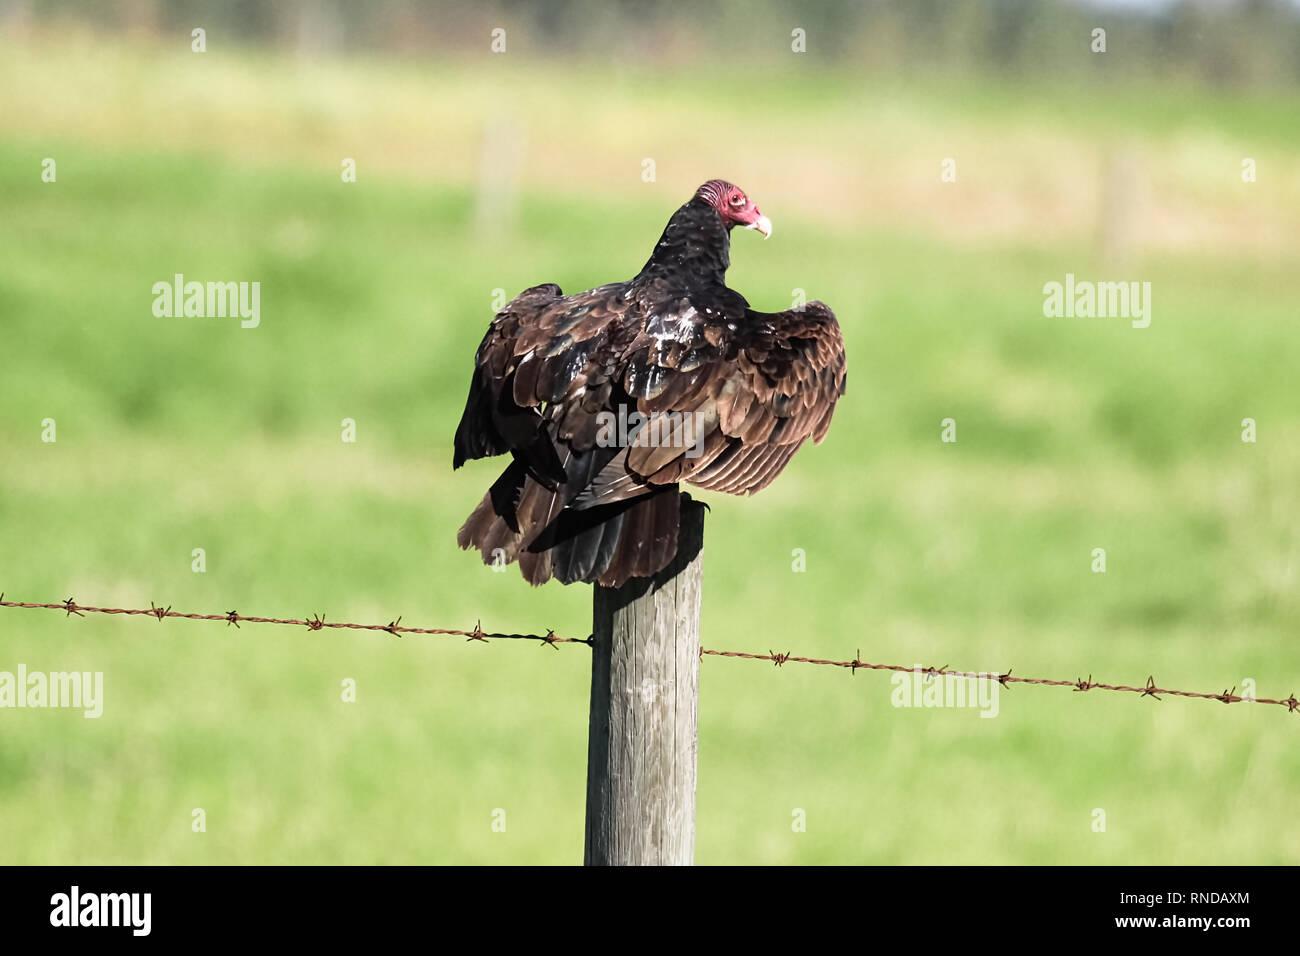 A turkey buzzard sits on a fence post - Stock Image